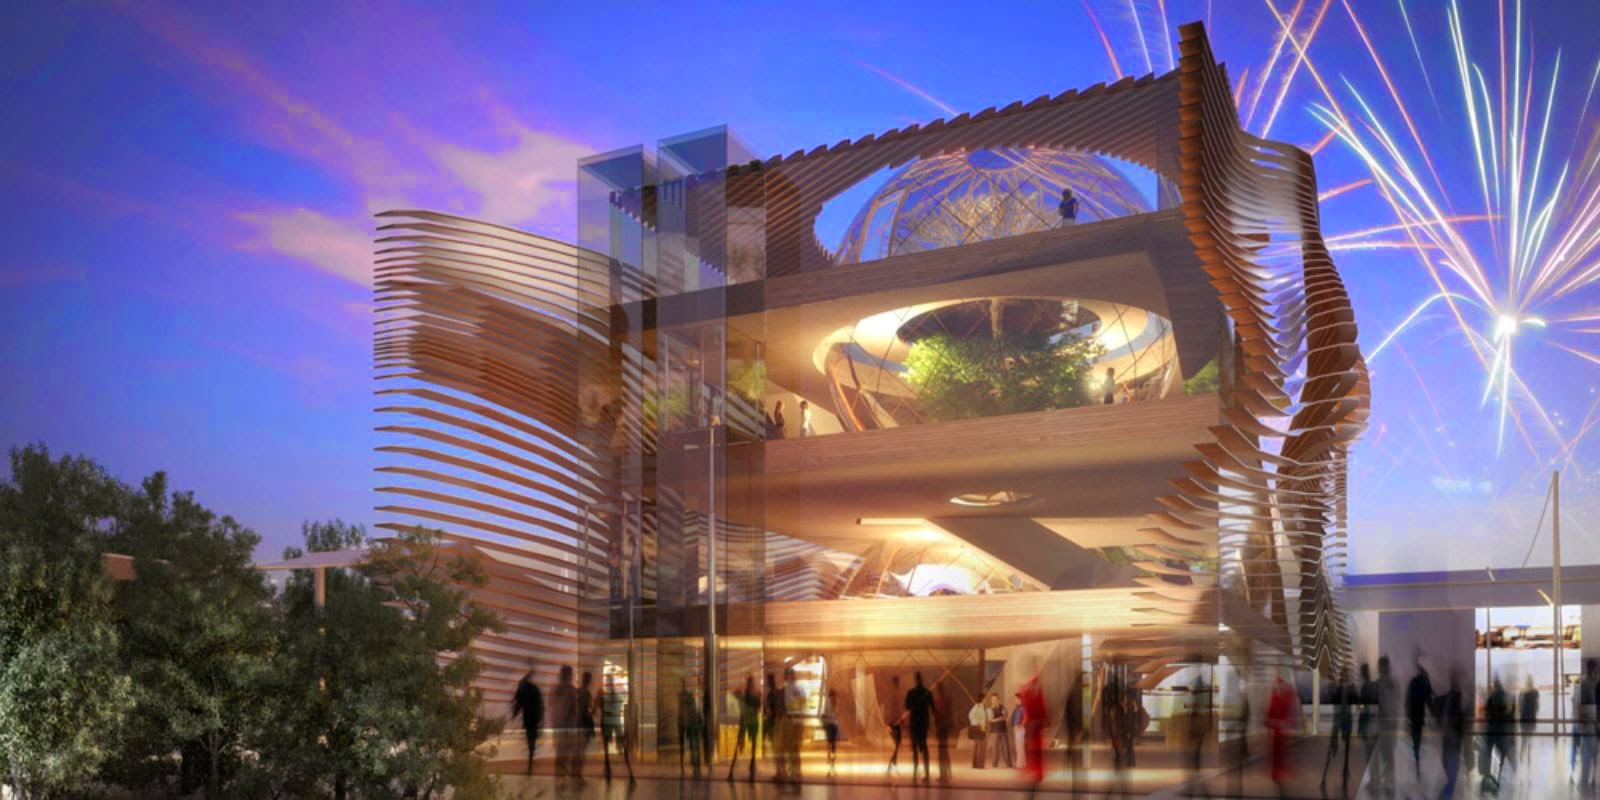 Italian House Plans Design Dautore Com Expo 2015 Azerbaijan Pavilion By